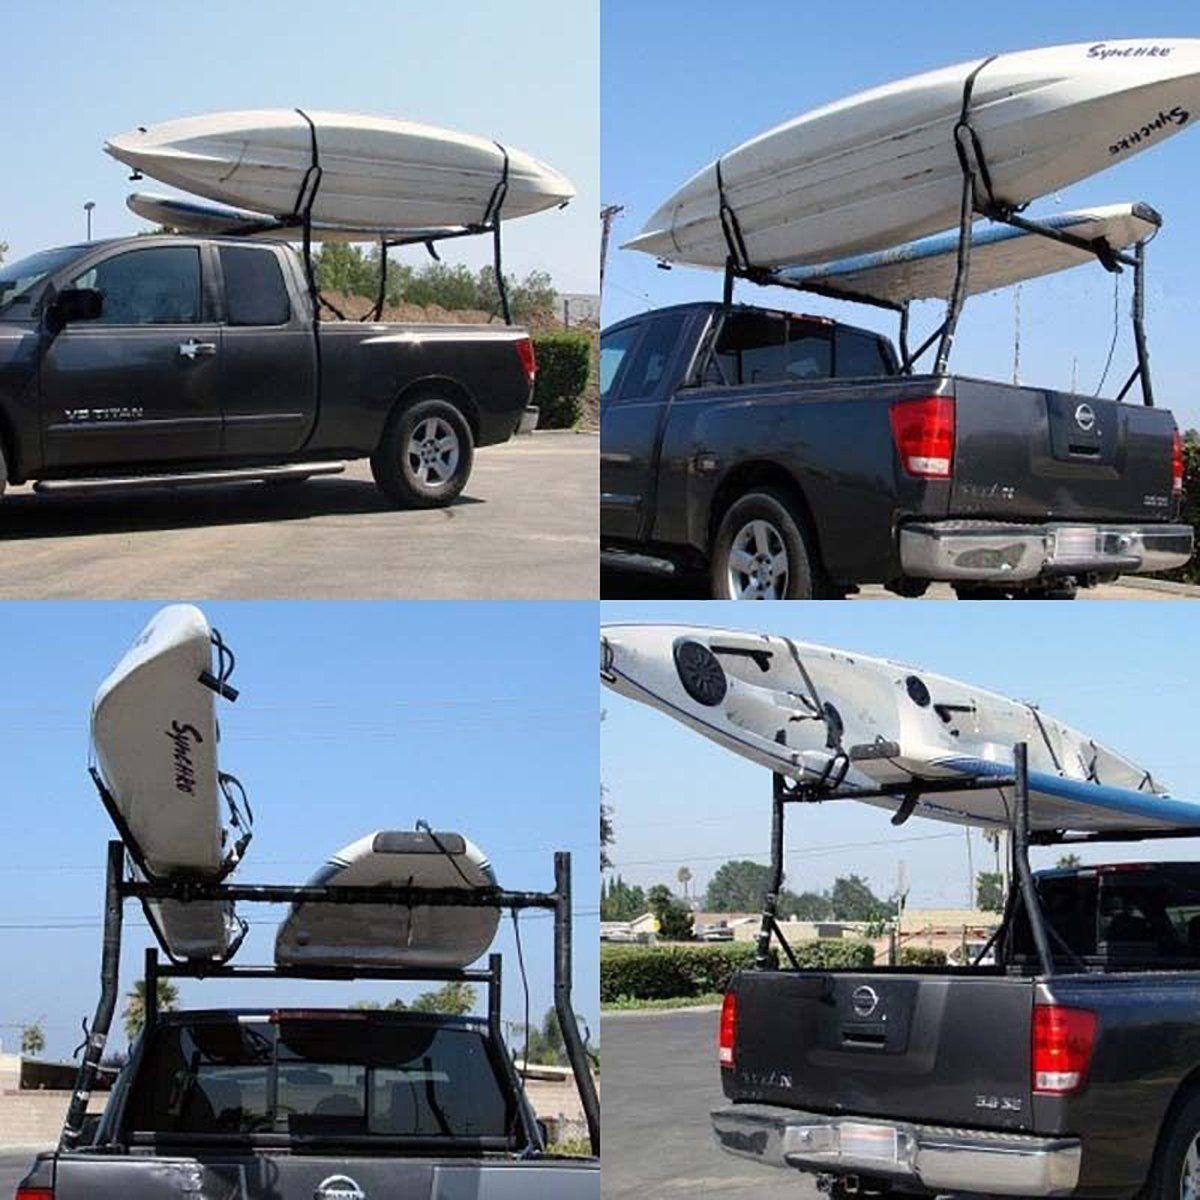 2 Pairs Universal Roof J-Bar Rack Kayak Boat Canoe Car SUV Top Mount Carrier New